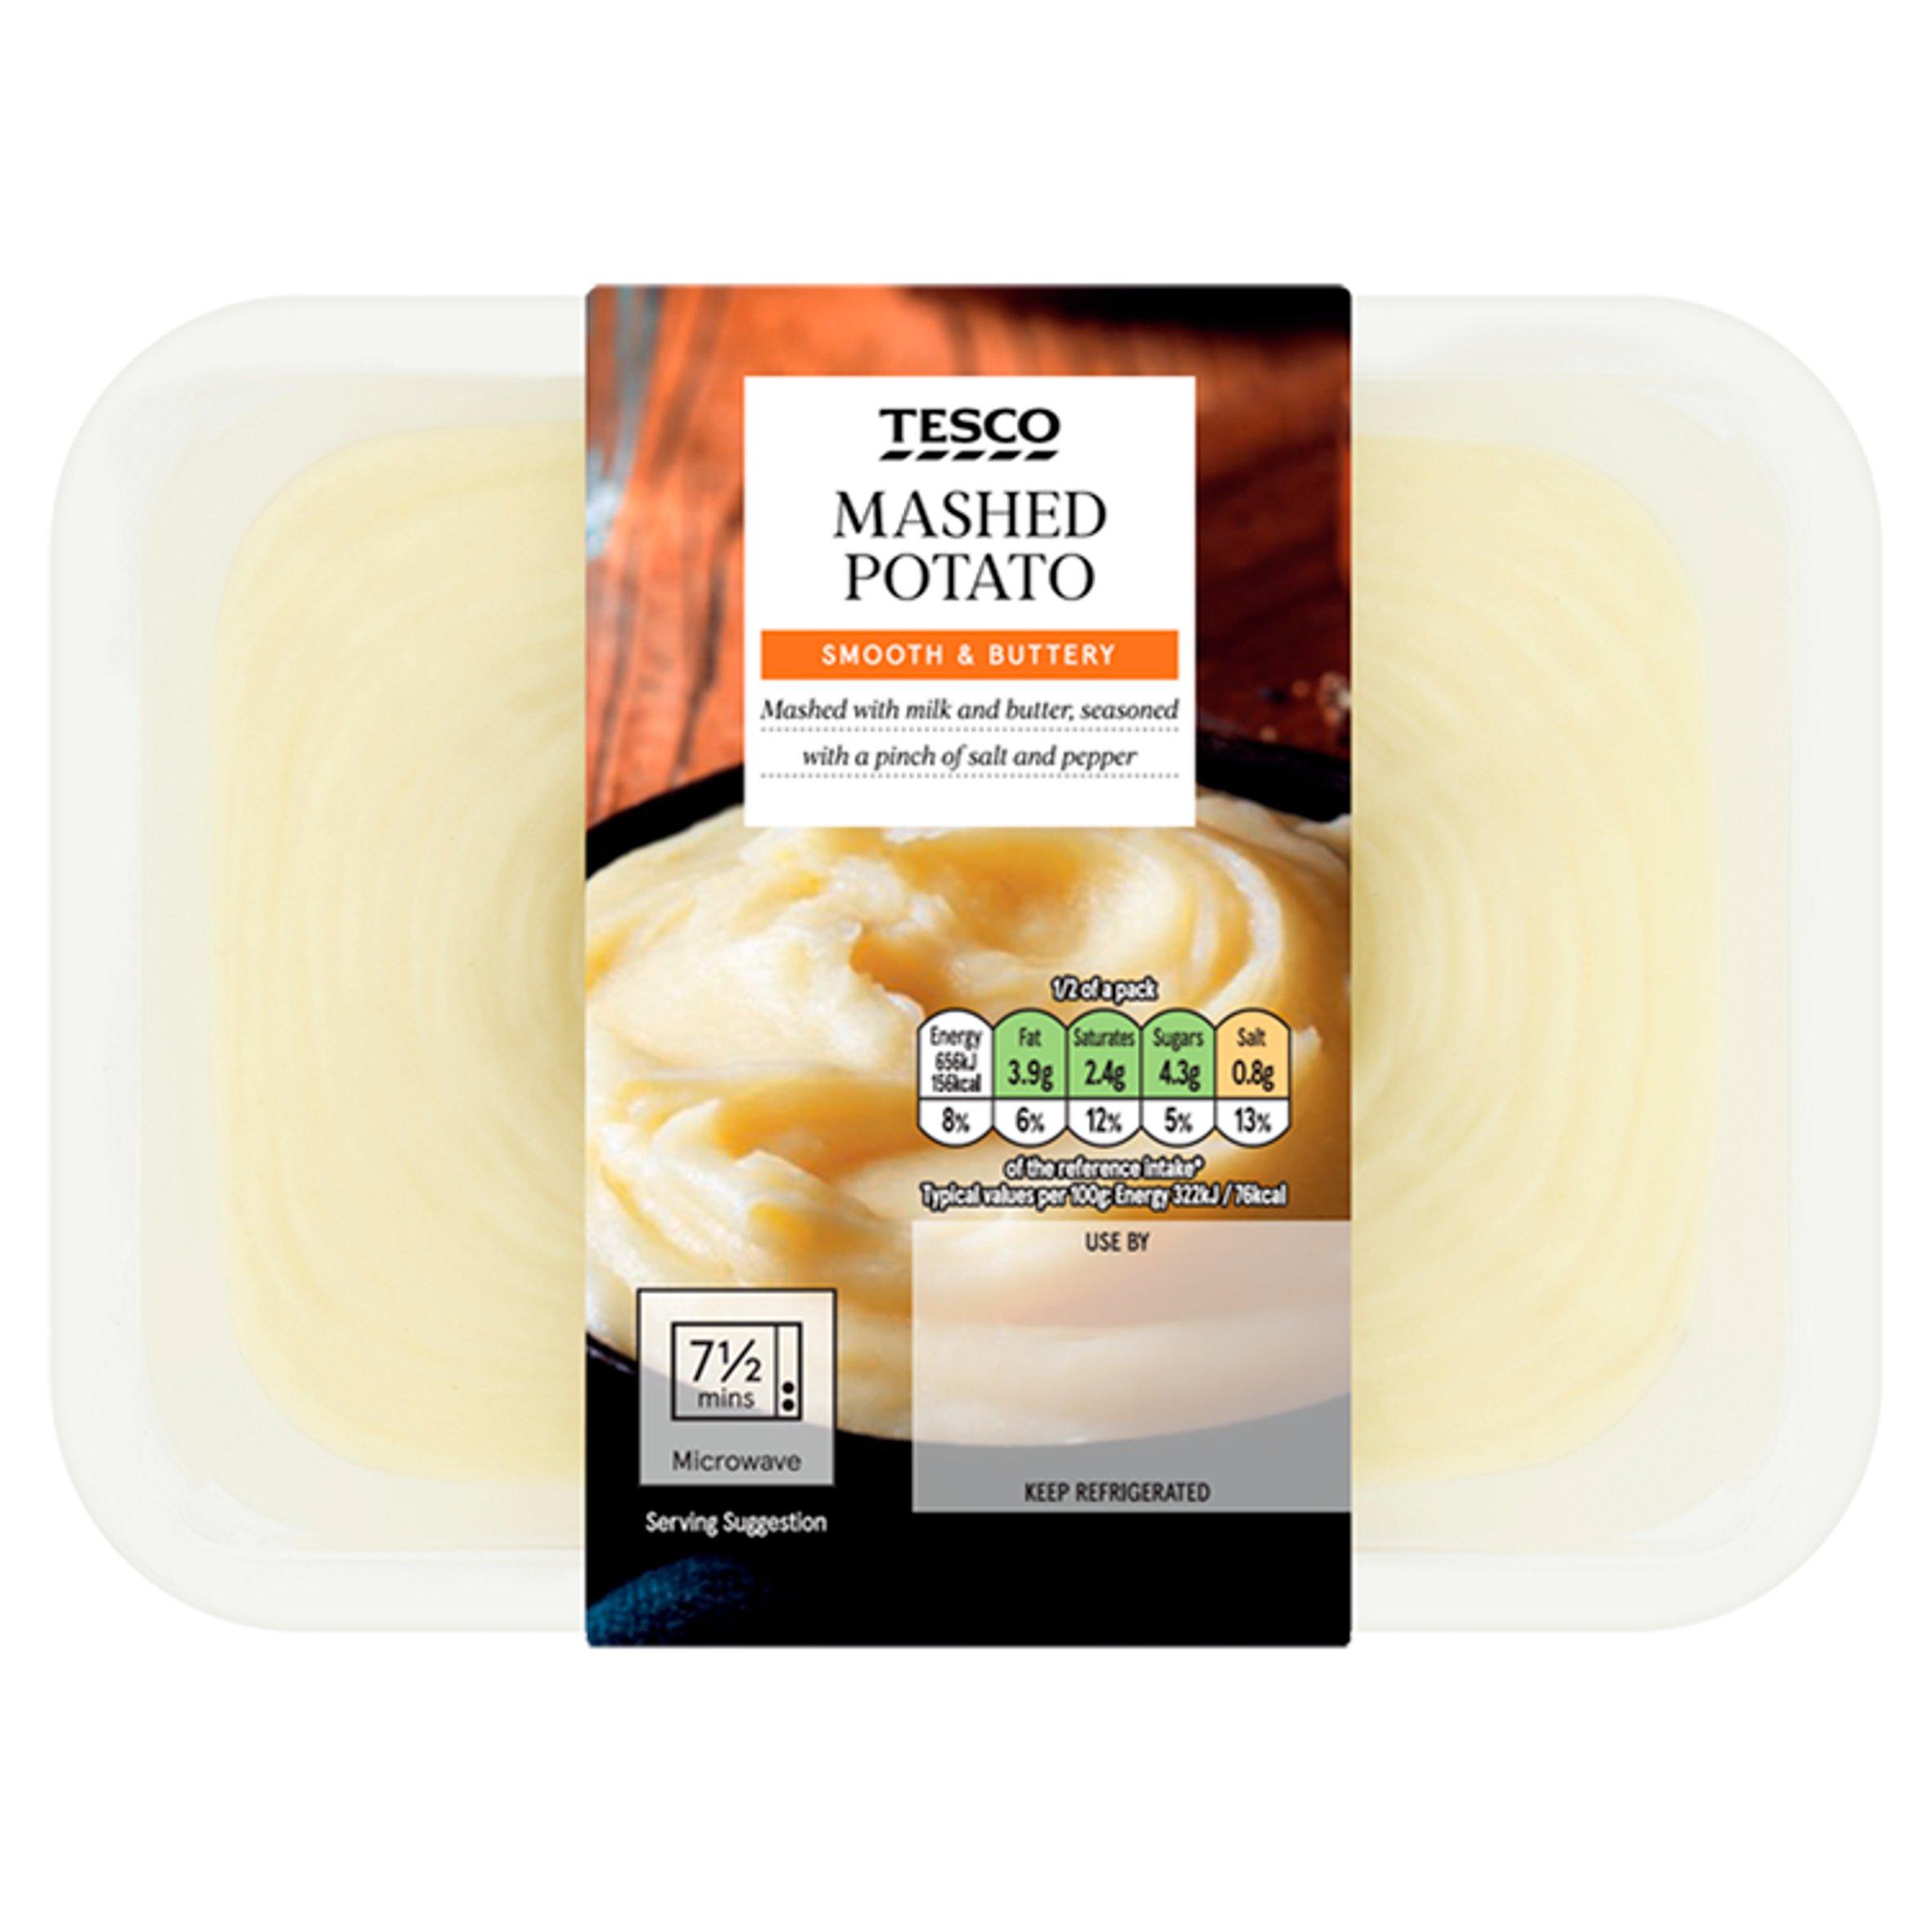 Tesco Mashed Potato 425G